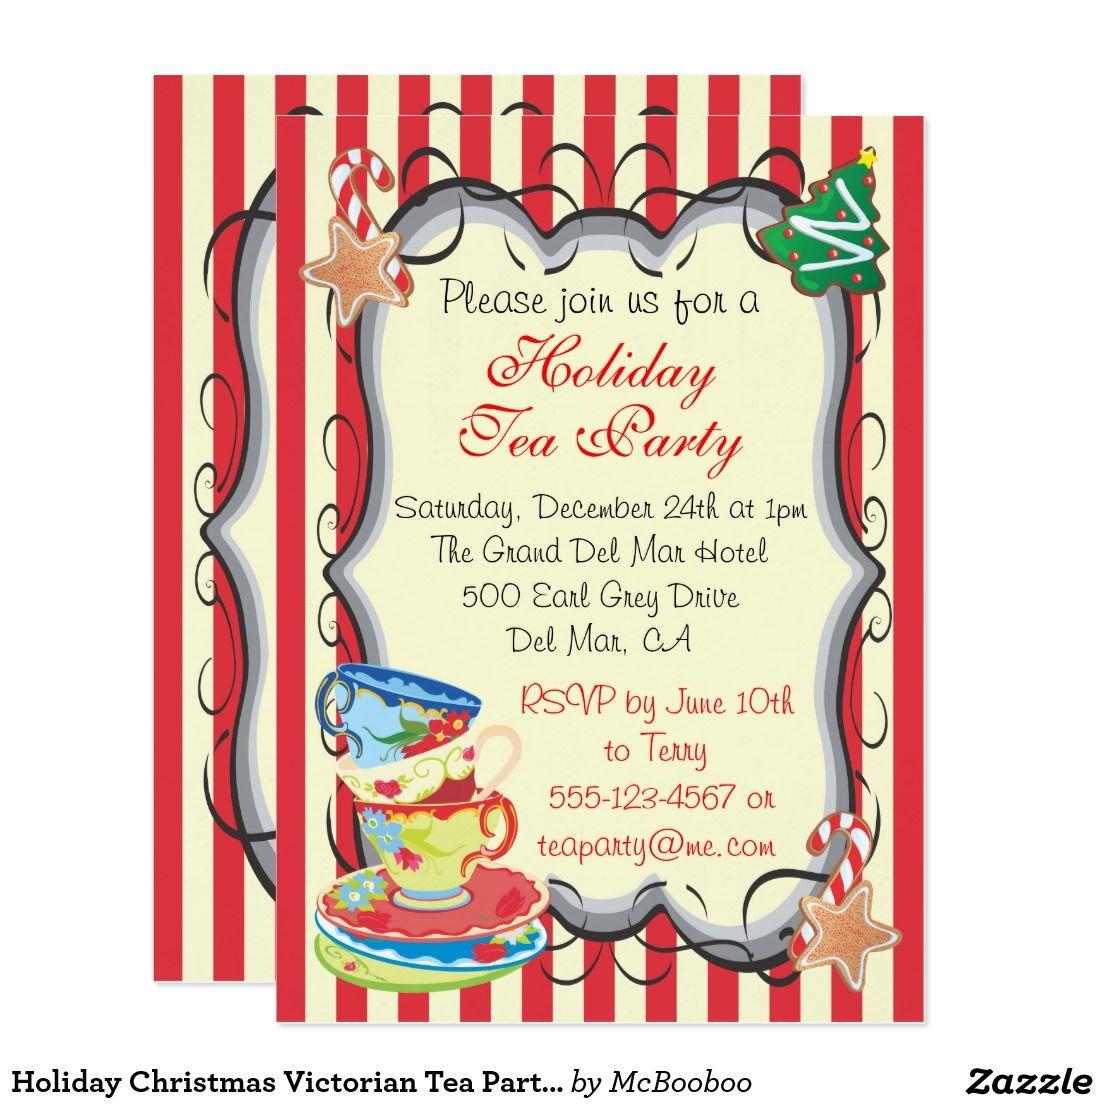 Holiday Christmas Victorian Tea Party Invitation   Tea Party ...